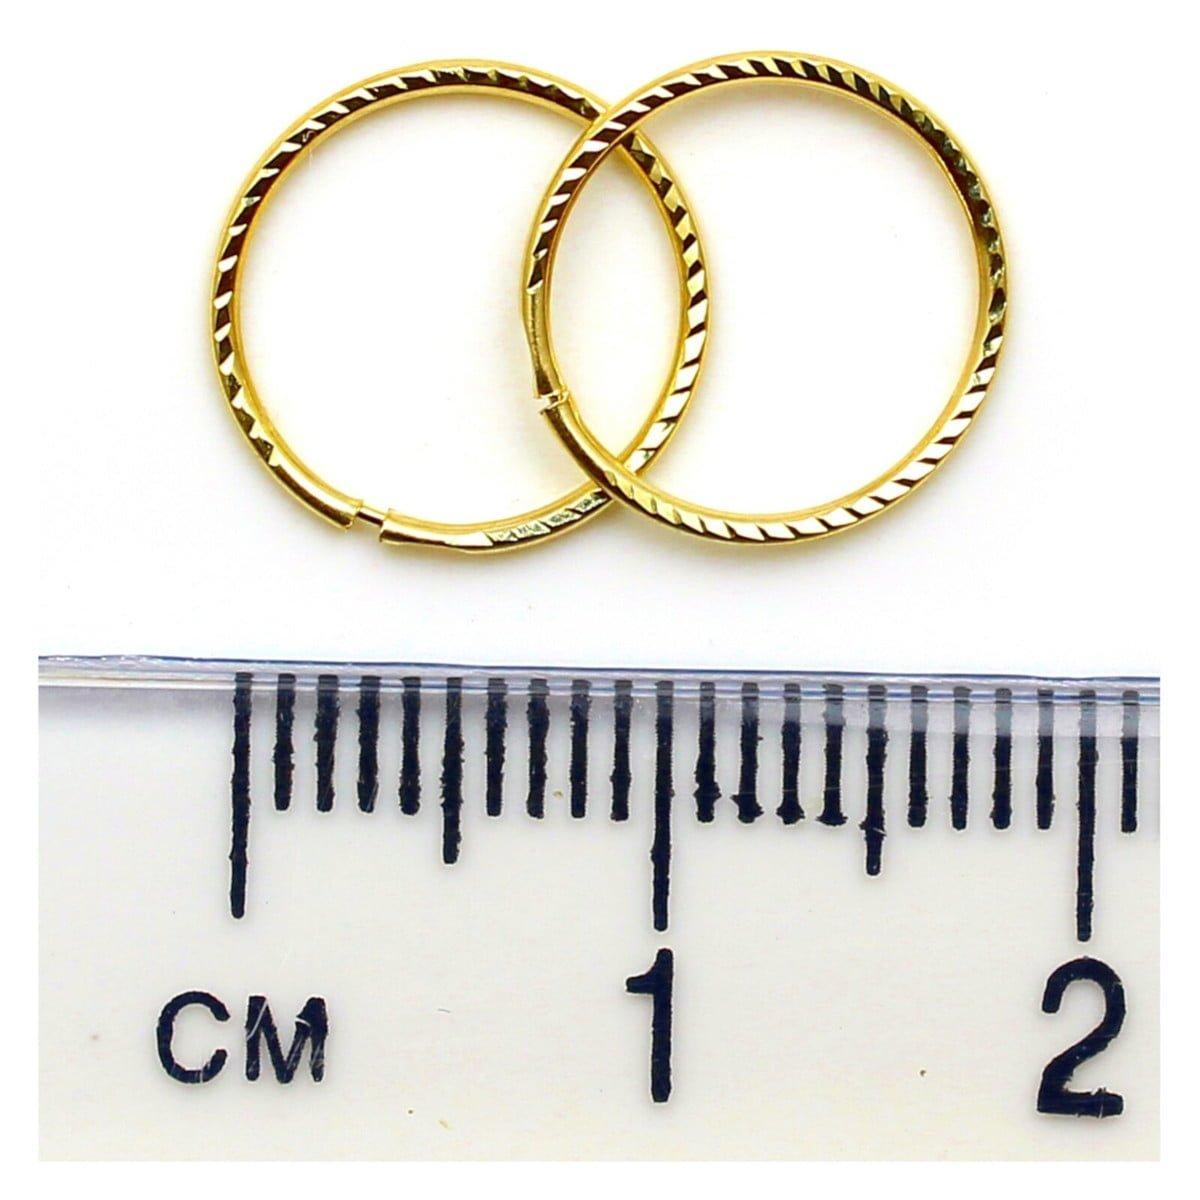 12 mm diamond cut sleeper hoops (1 pair) in 9ct yellow gold ruler